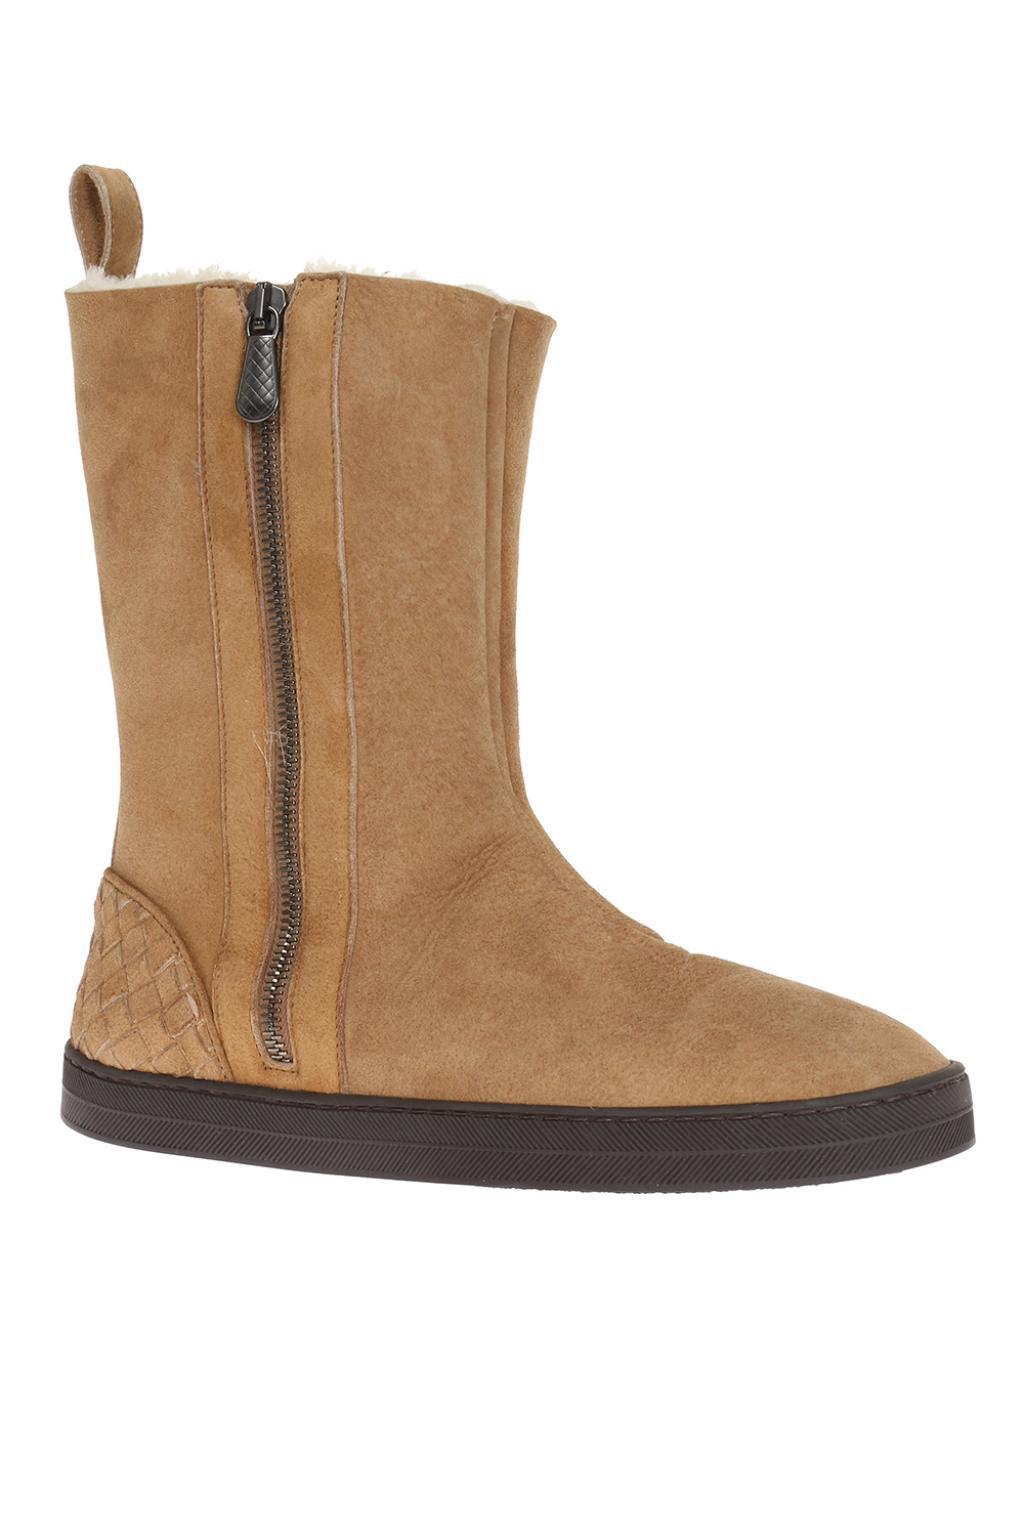 Bottega Veneta Suede Intrecciato Shoes In Brown Lyst